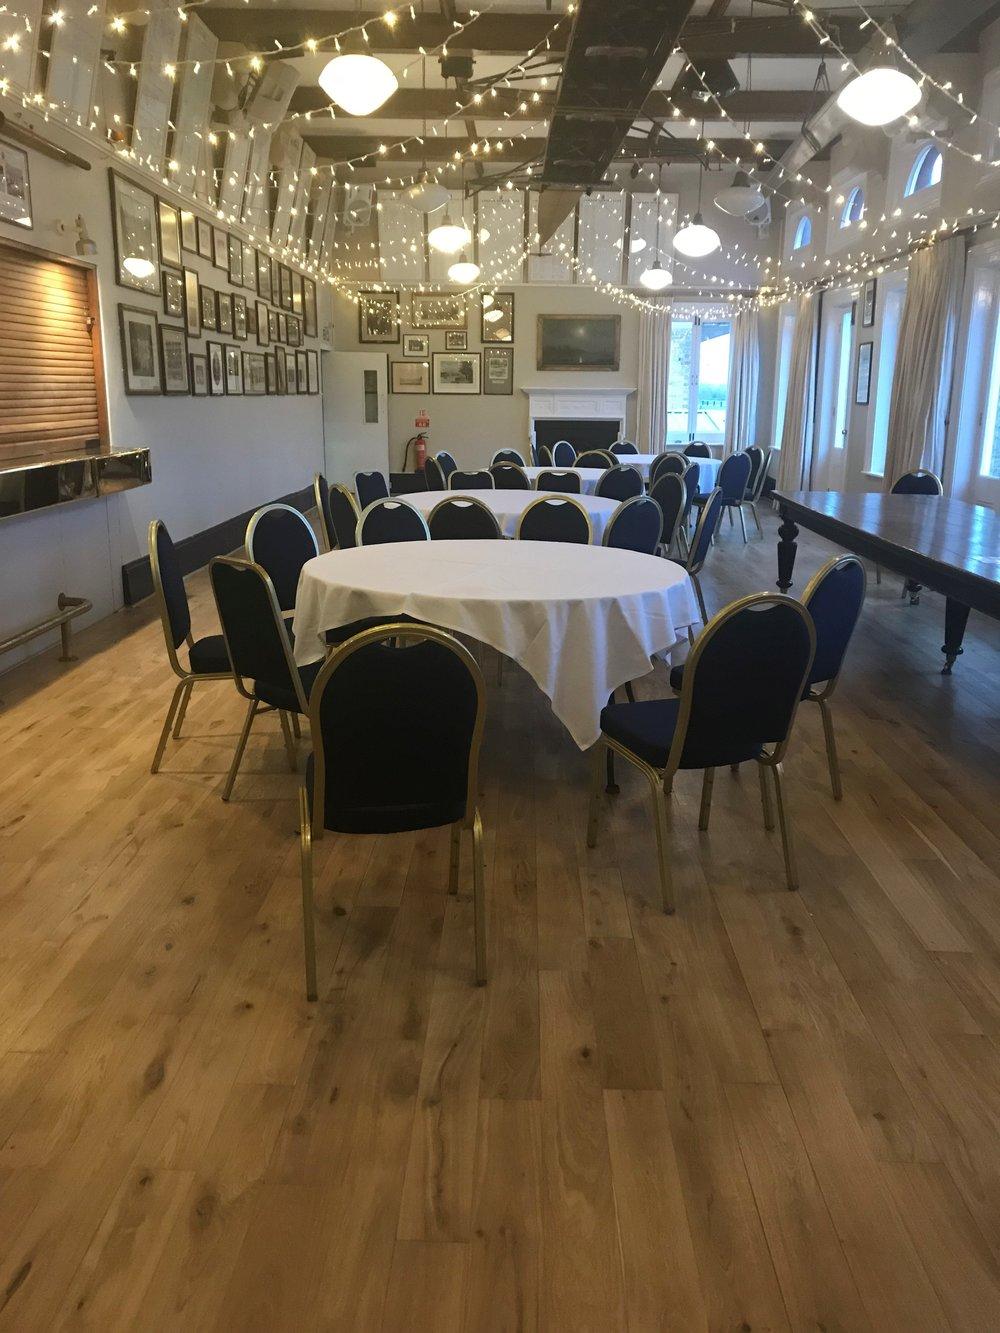 London_Rowing_Club_2019_polished_floor_5.jpg